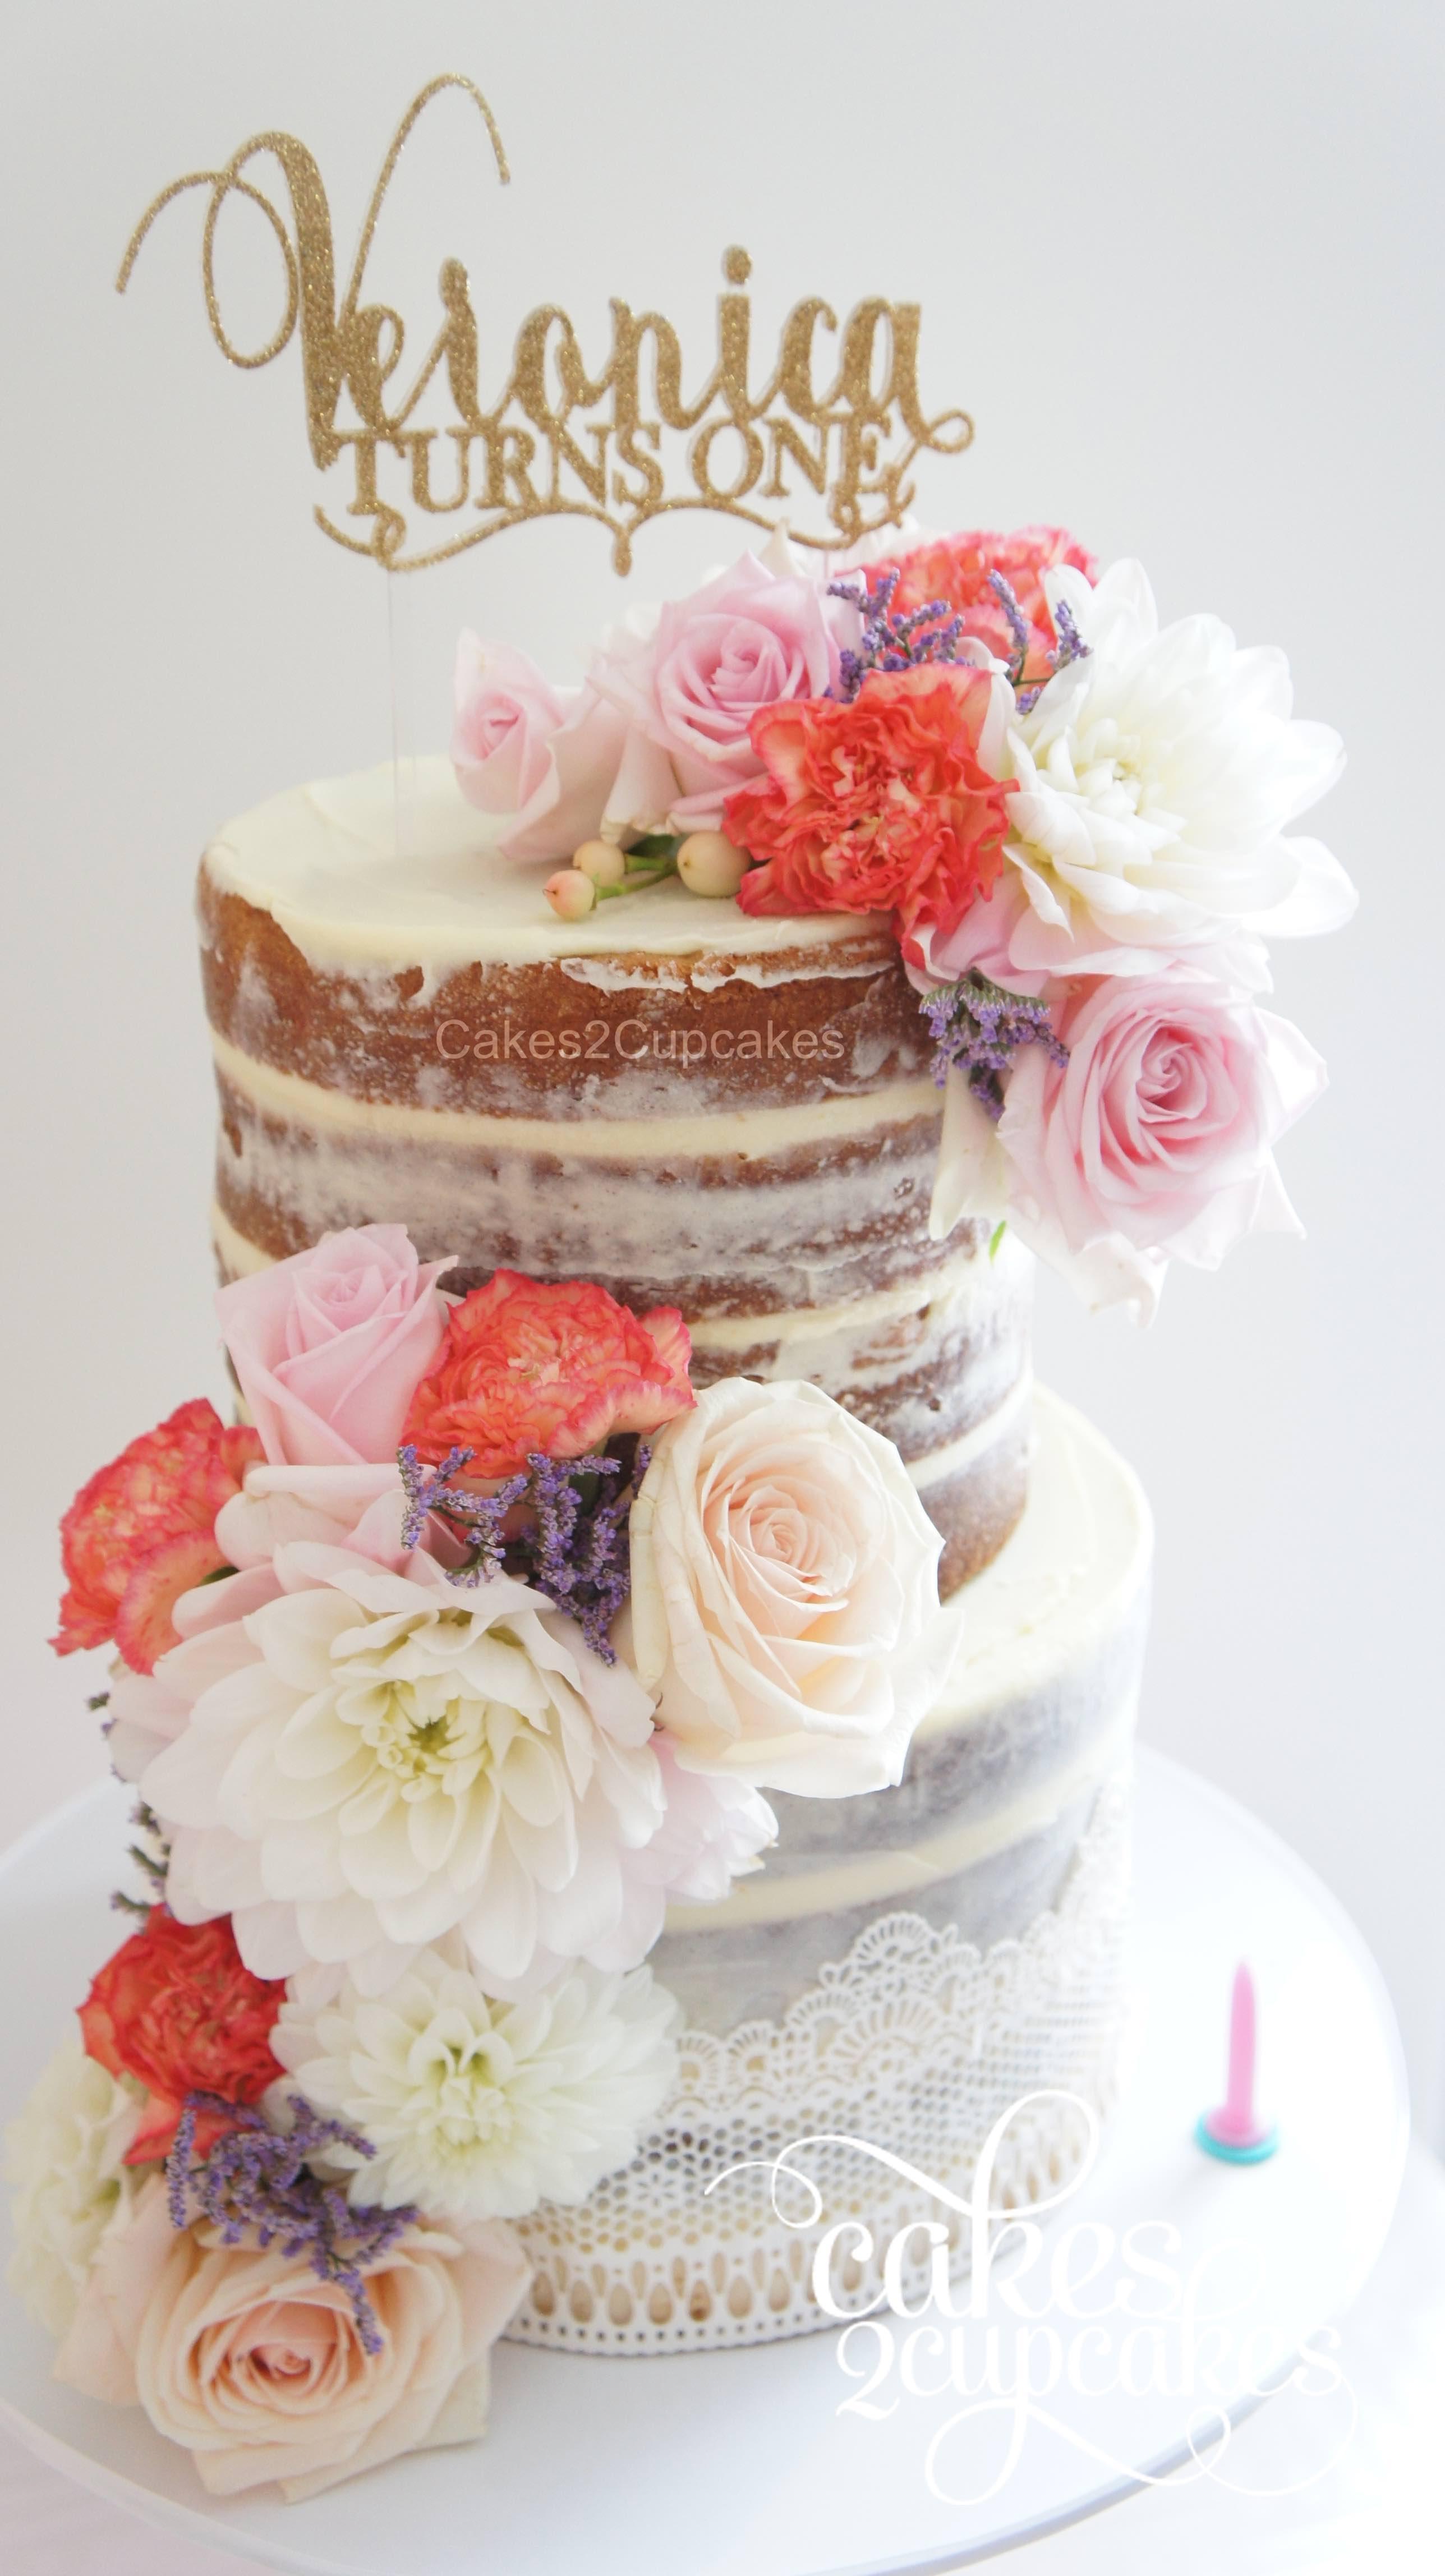 cakes2cupcakes-veronica